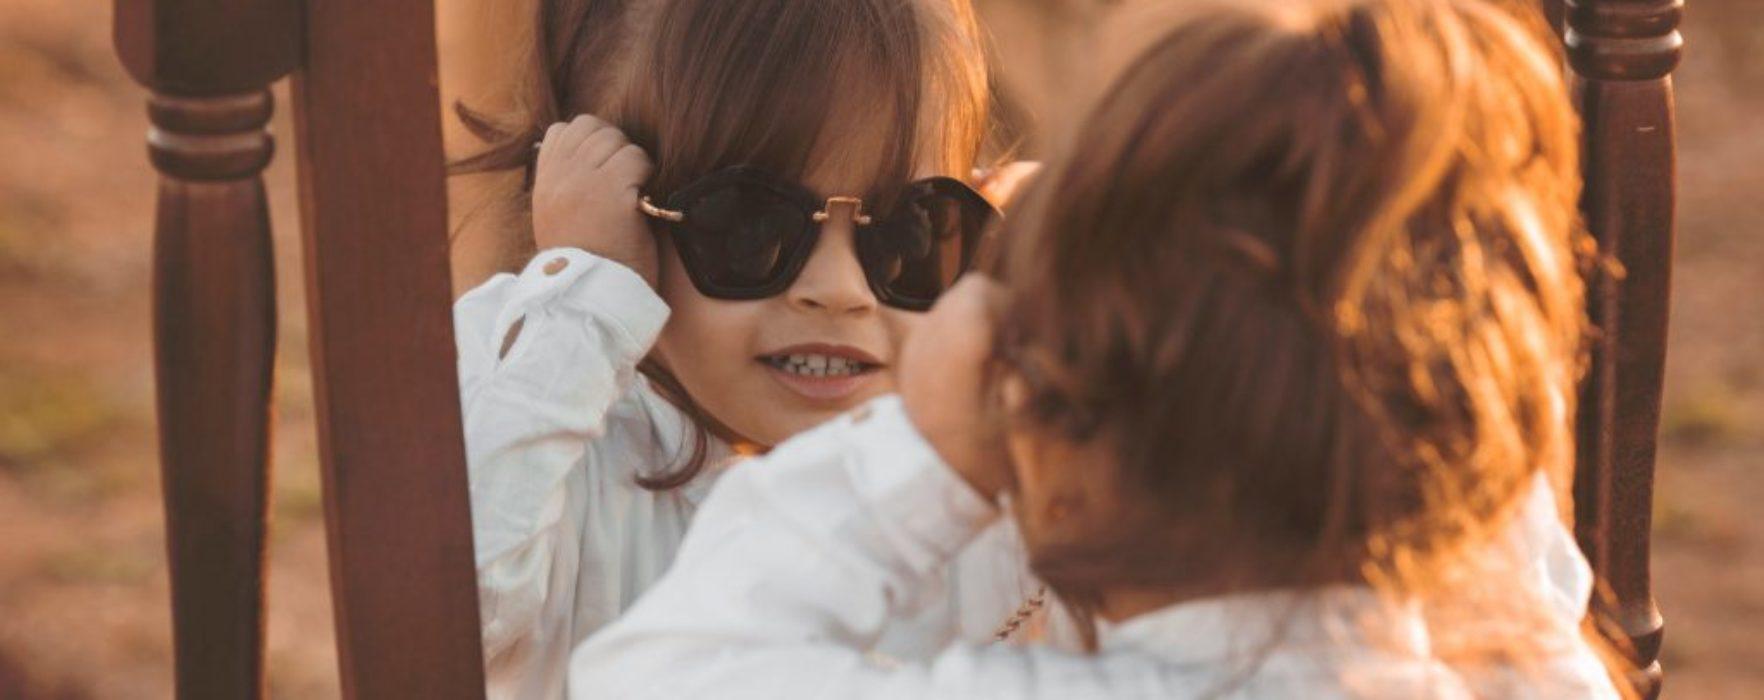 More than half of parents think sunglasses should be mandatory part of school uniform